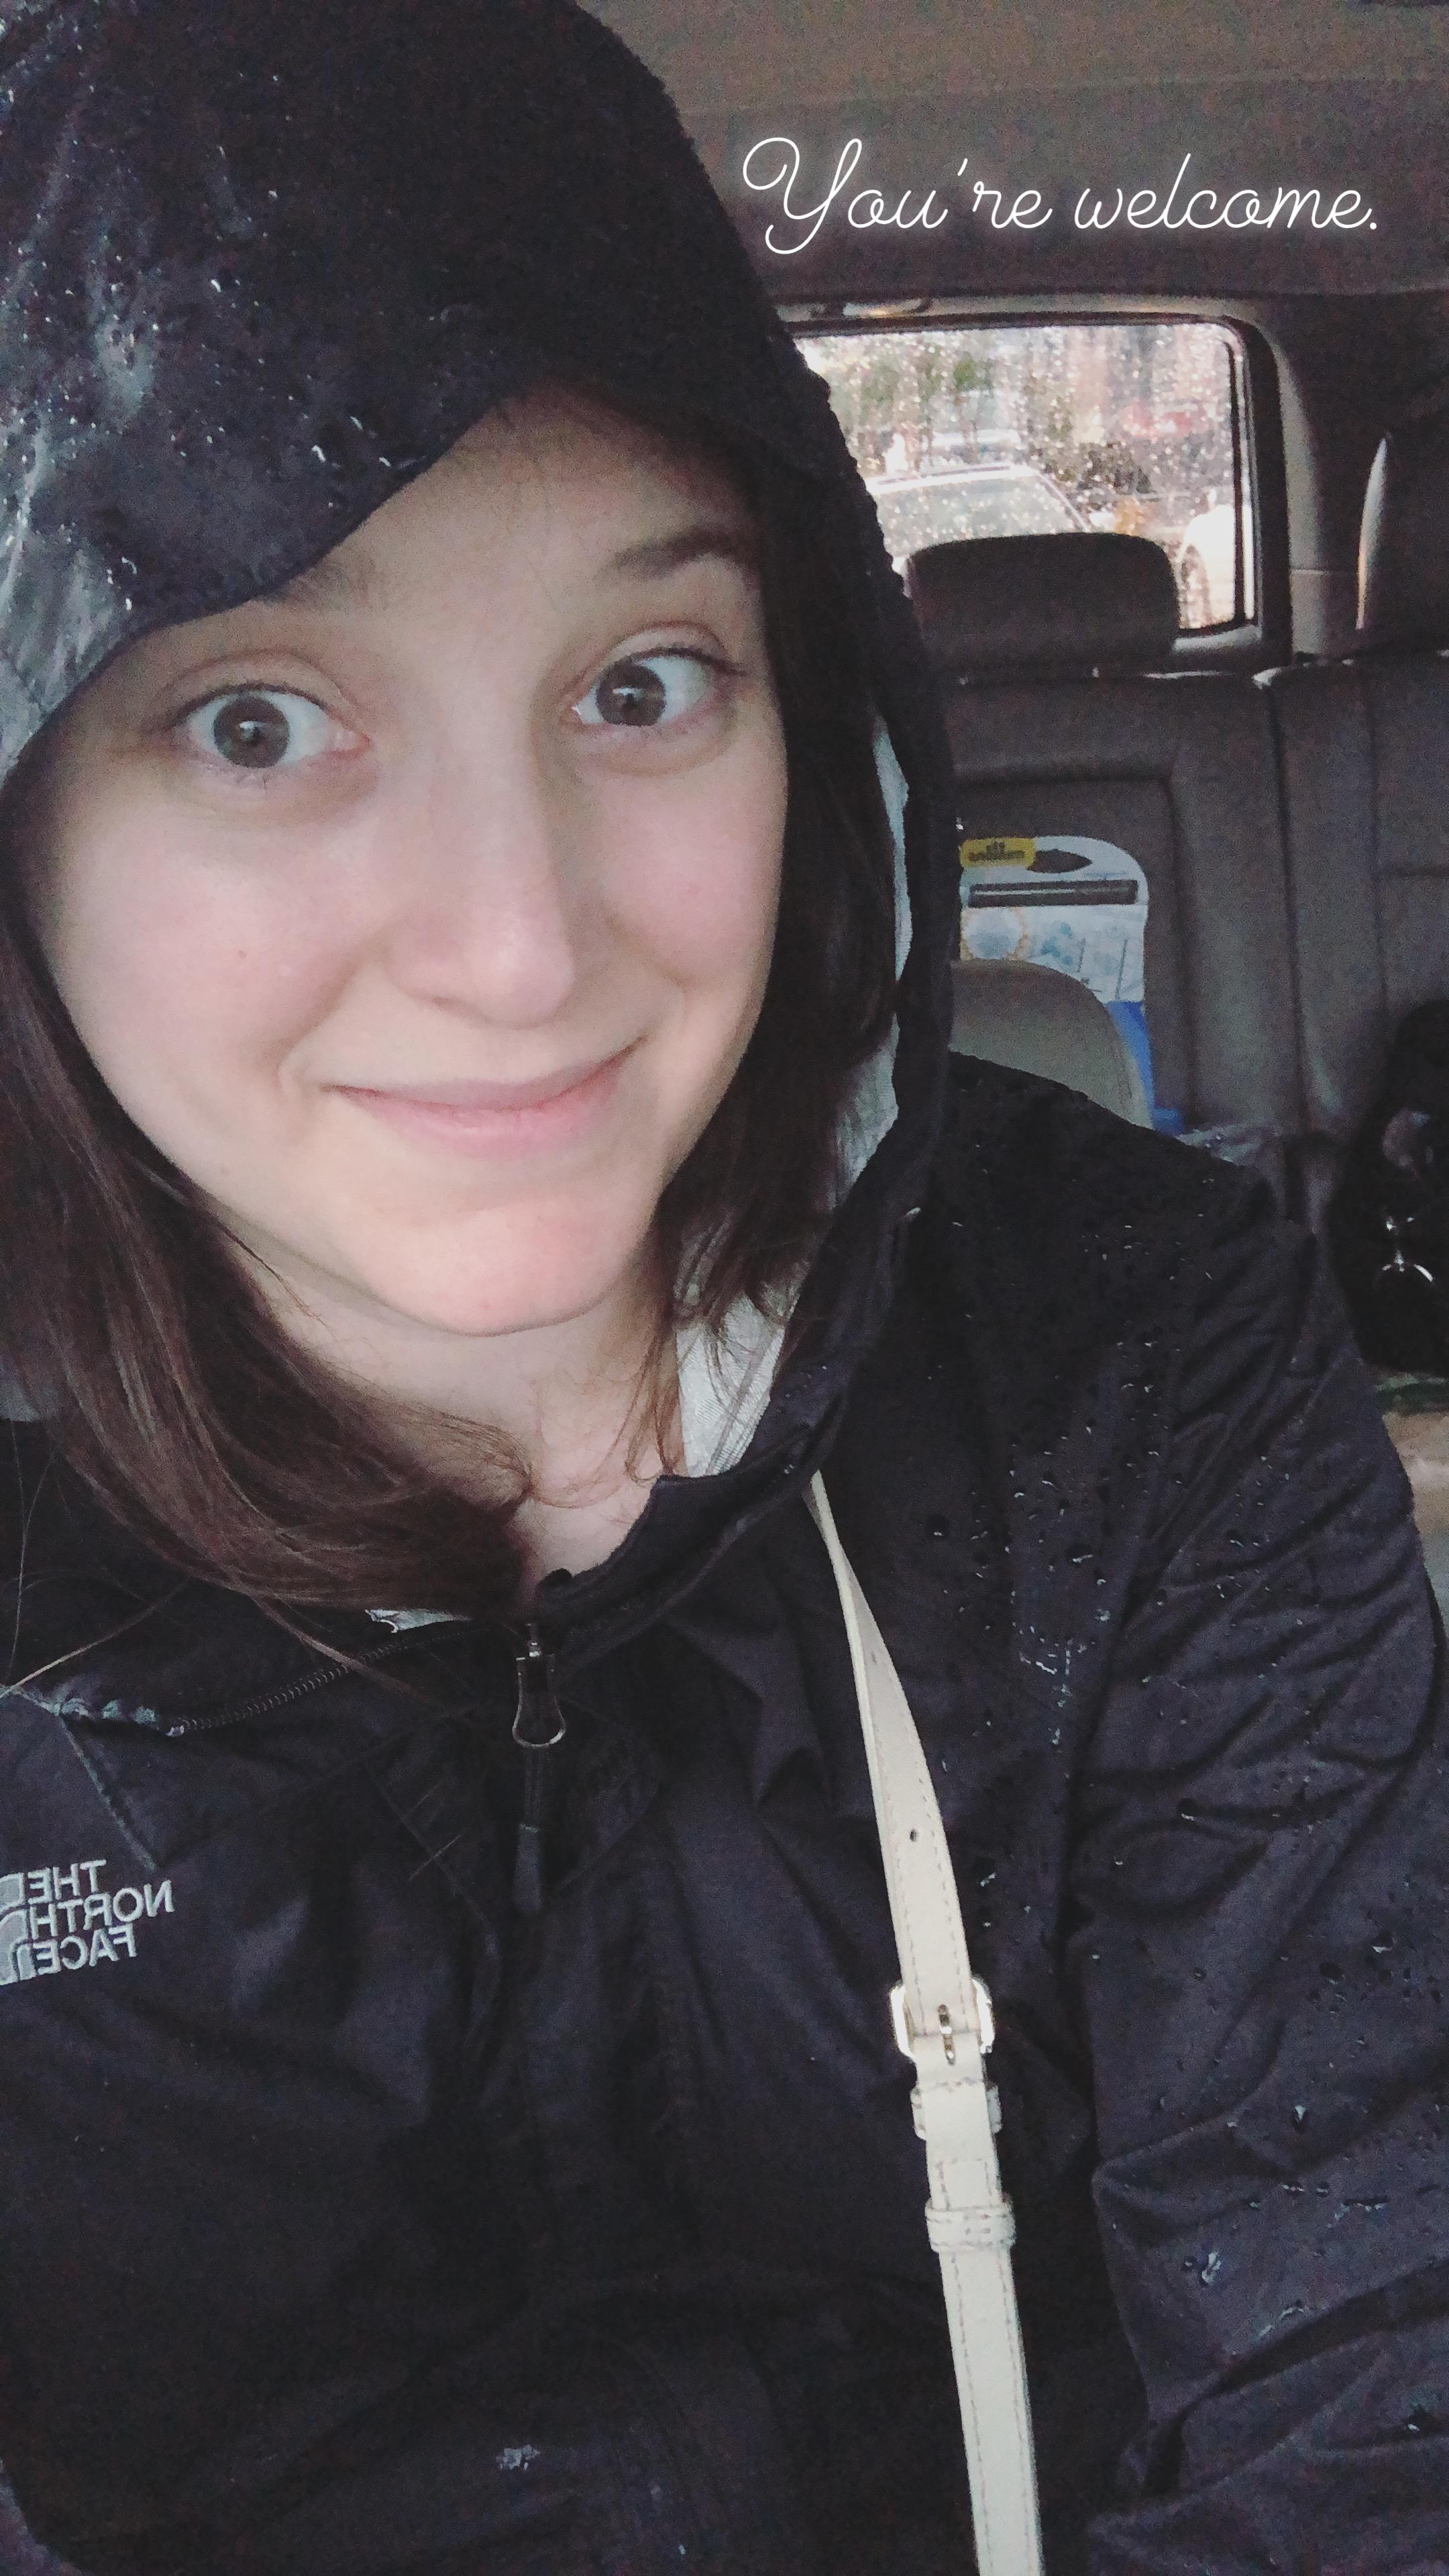 birchcollective-shop-instagram-story-july-7-2018-the-north-face-rain-jacket-black